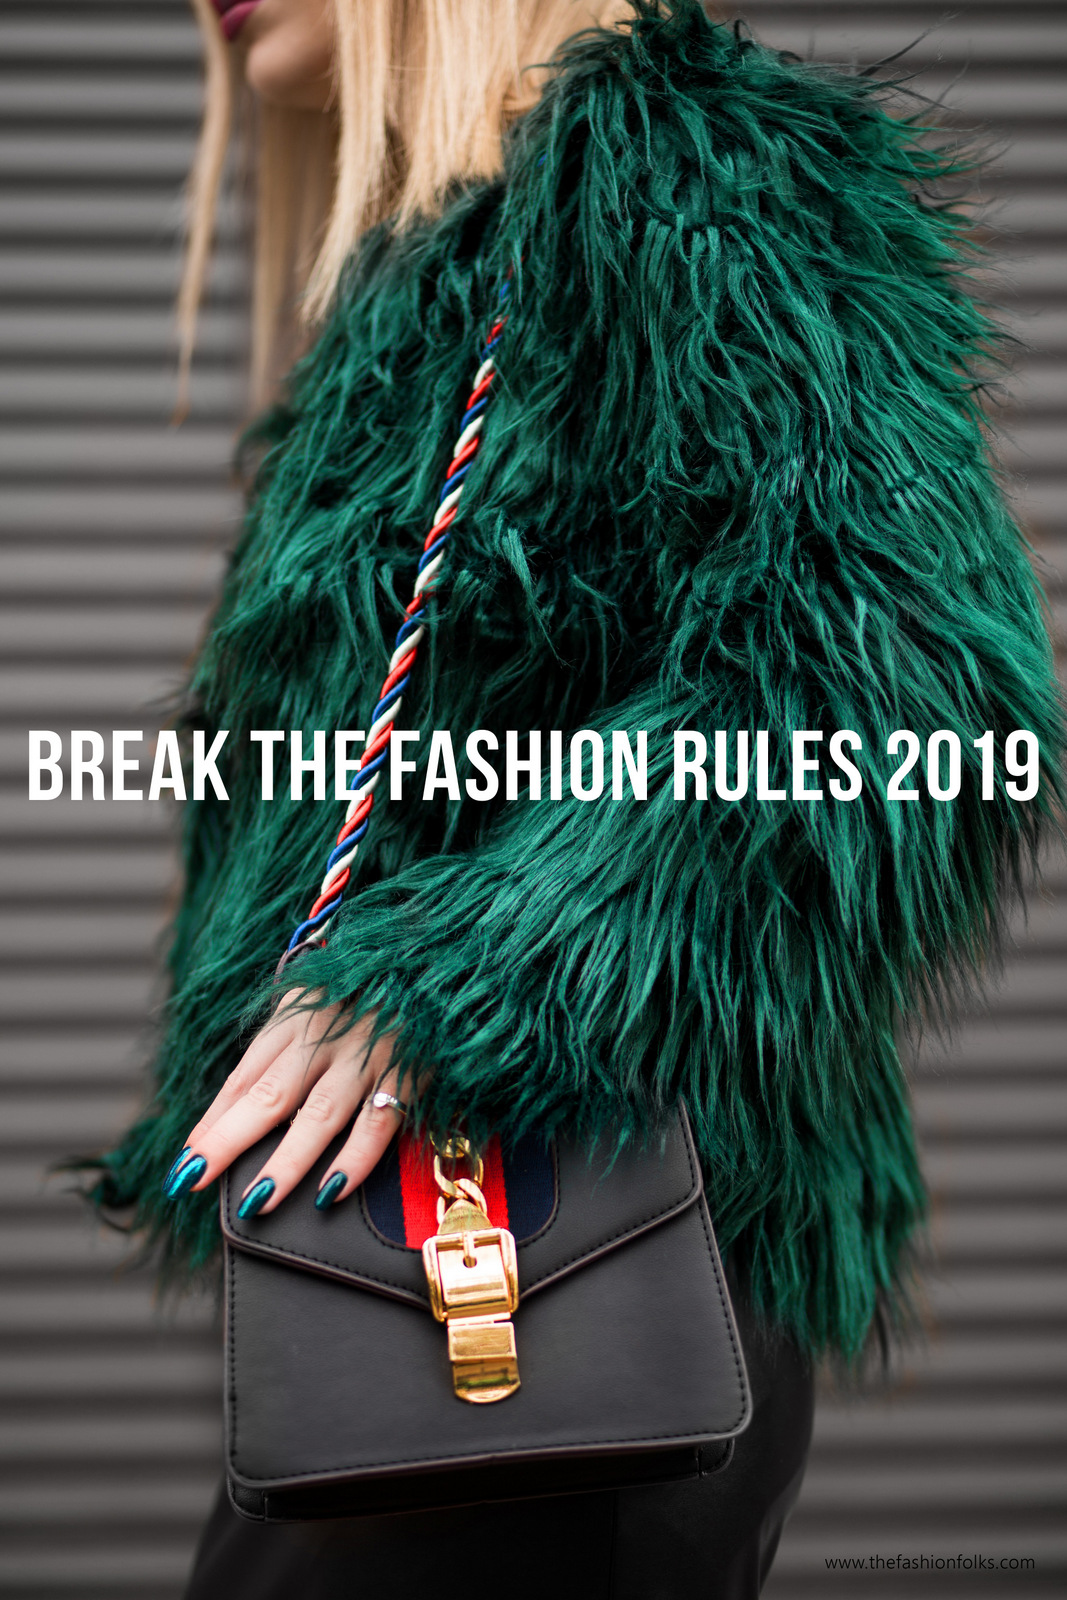 Break The Fashion Rules 2019